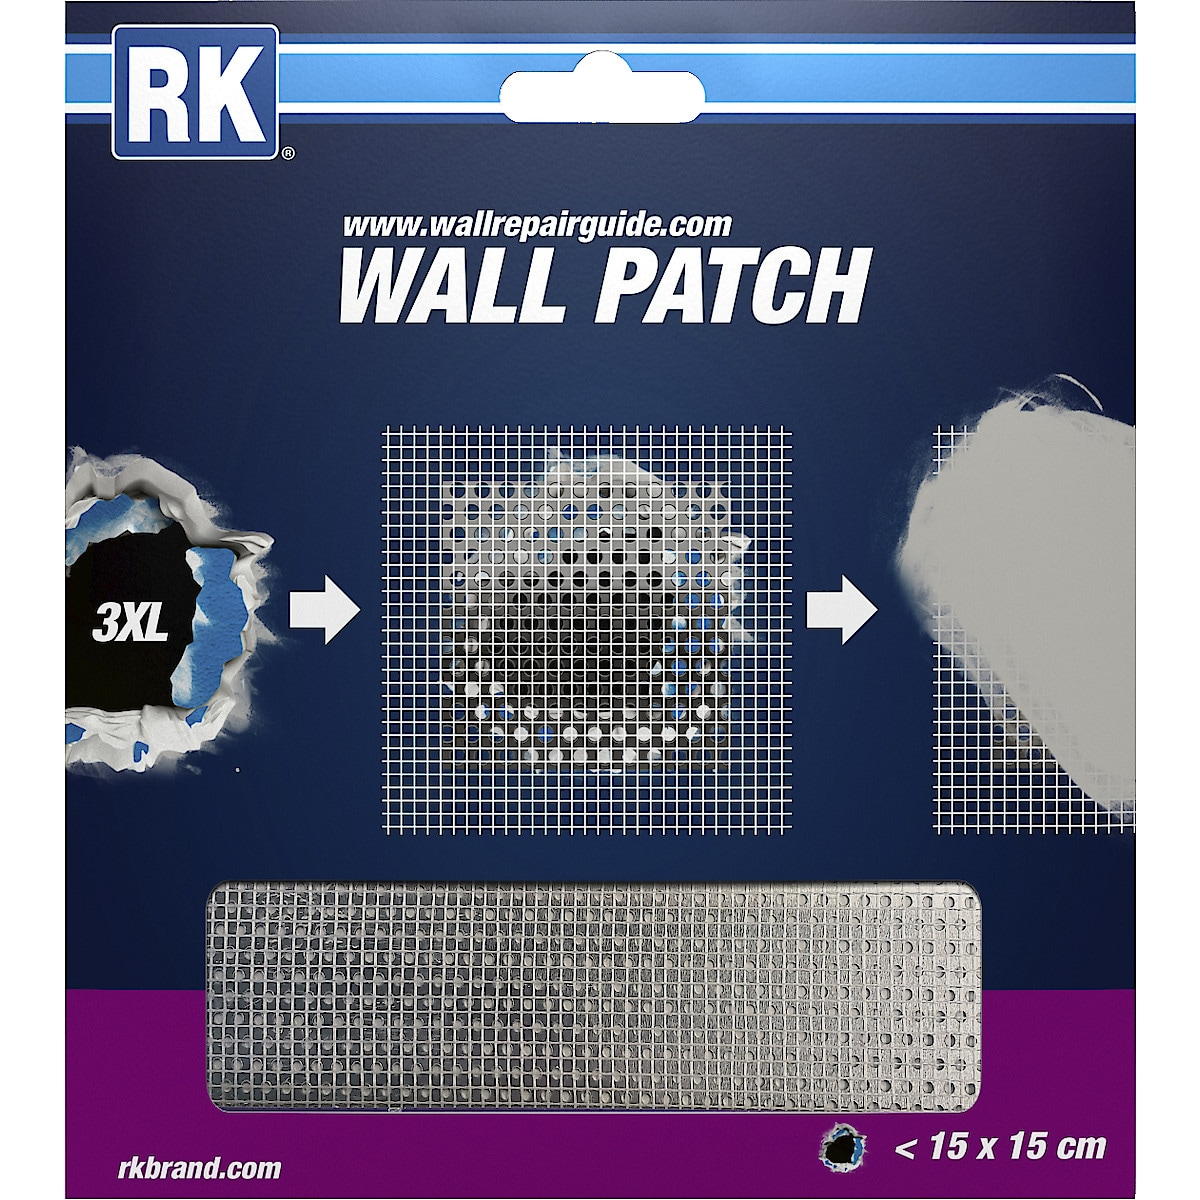 Wall Patch RK 15 x 15 cm